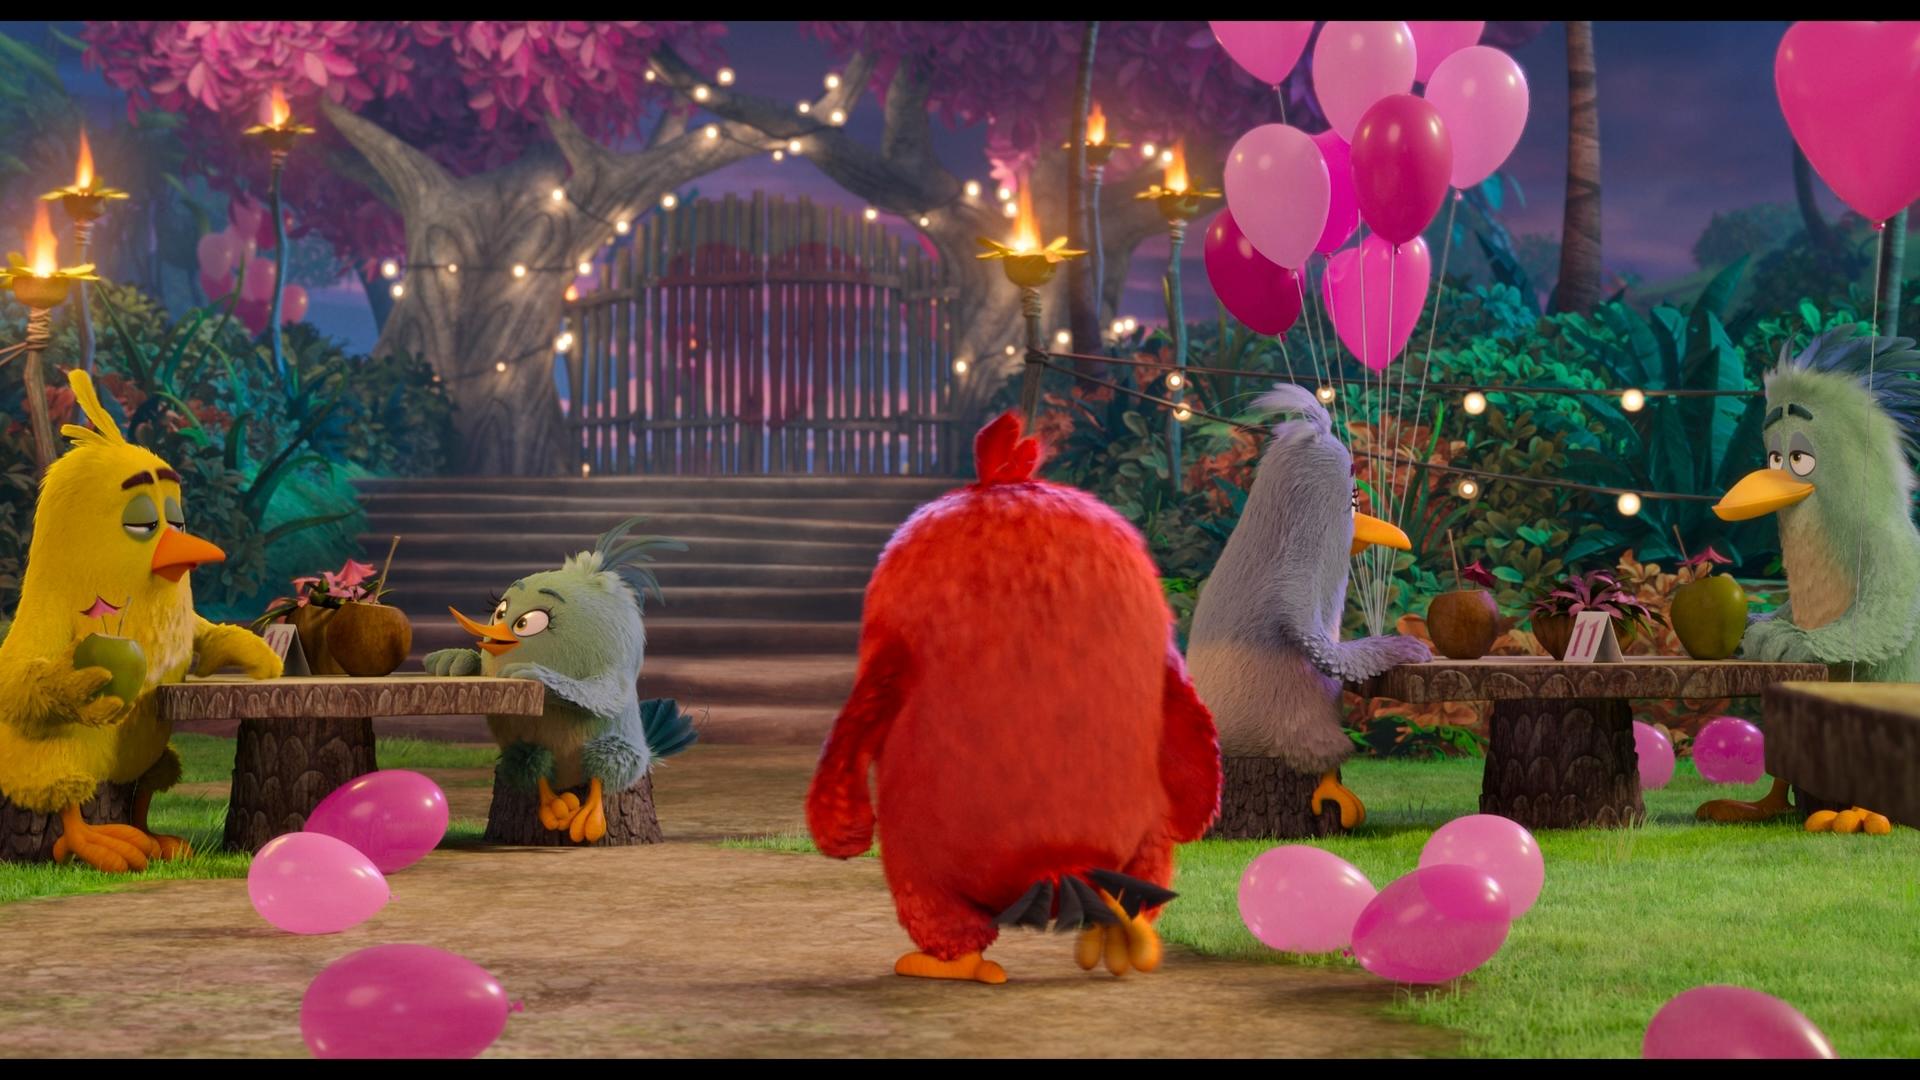 Angry Birds Duology 1080p BluRay REMUX AVC DTS HD MA 7.1 LameyHost ثنائية الطيور الغاضبة مدبلج للعربية تحميل تورنت 3 arabp2p.com